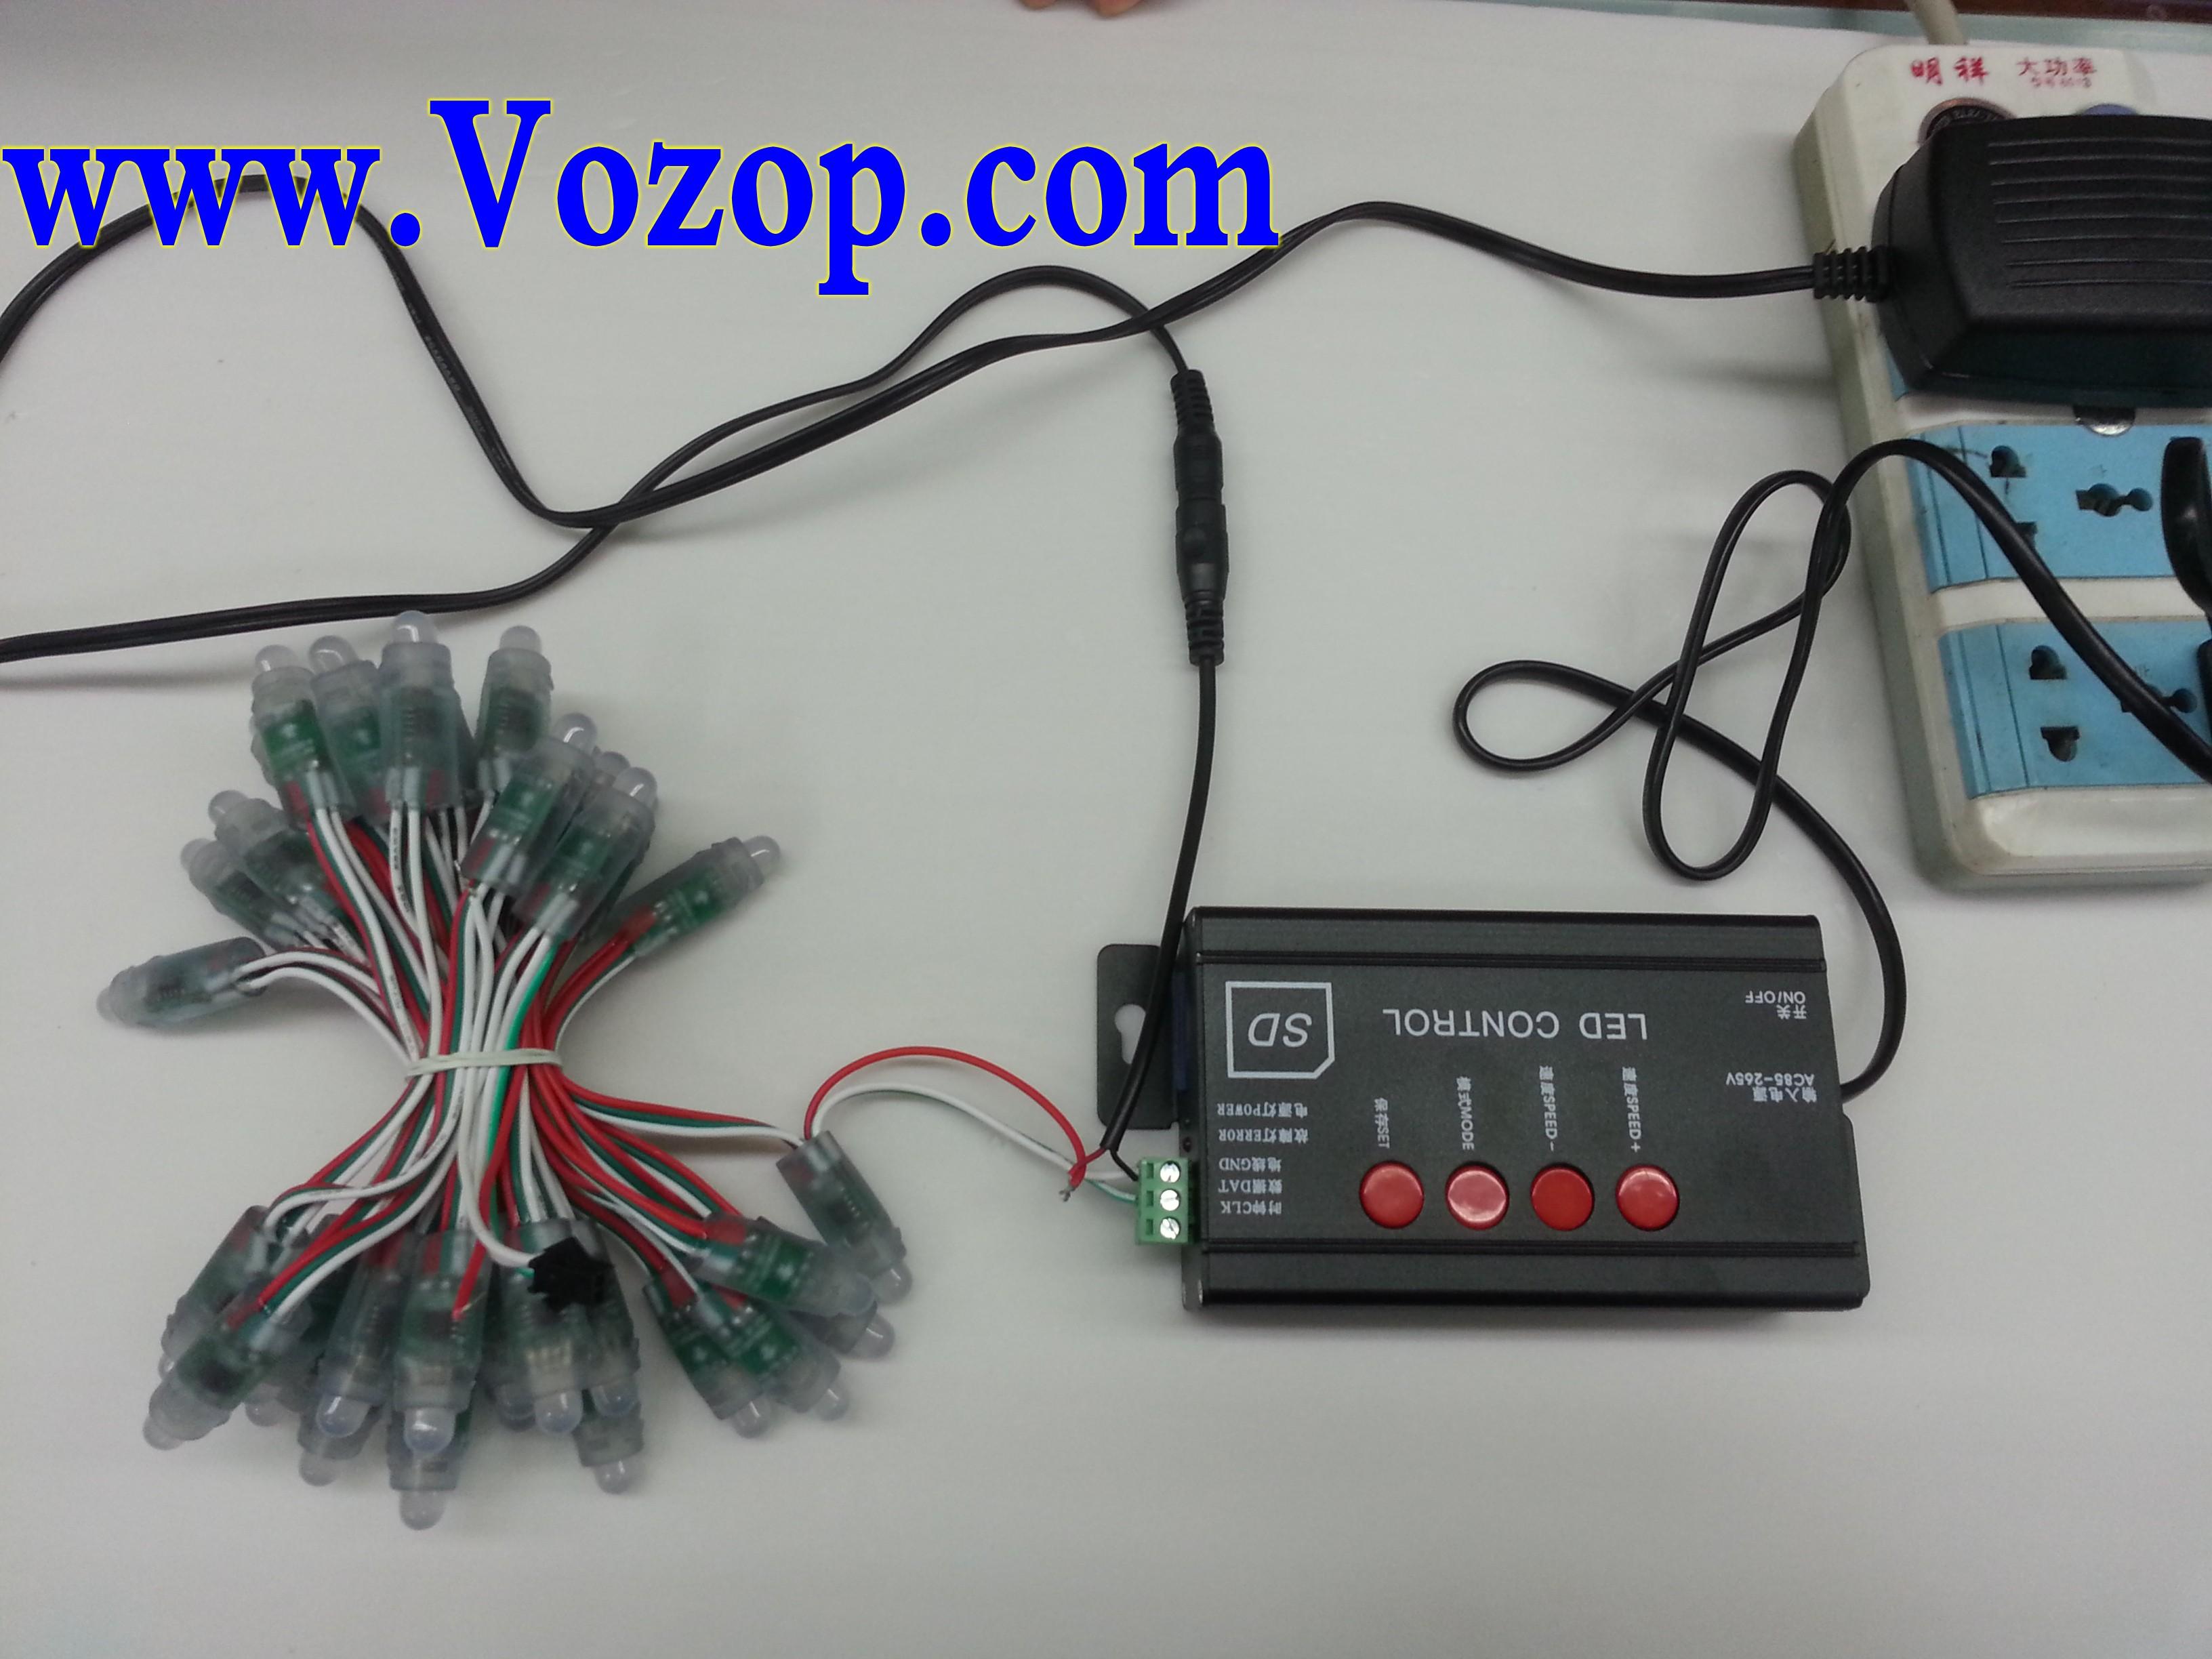 UCS_1903_LED_Module_DC_5V_Waterproof_RGB_LED_Pixel_Module_connection_project_12